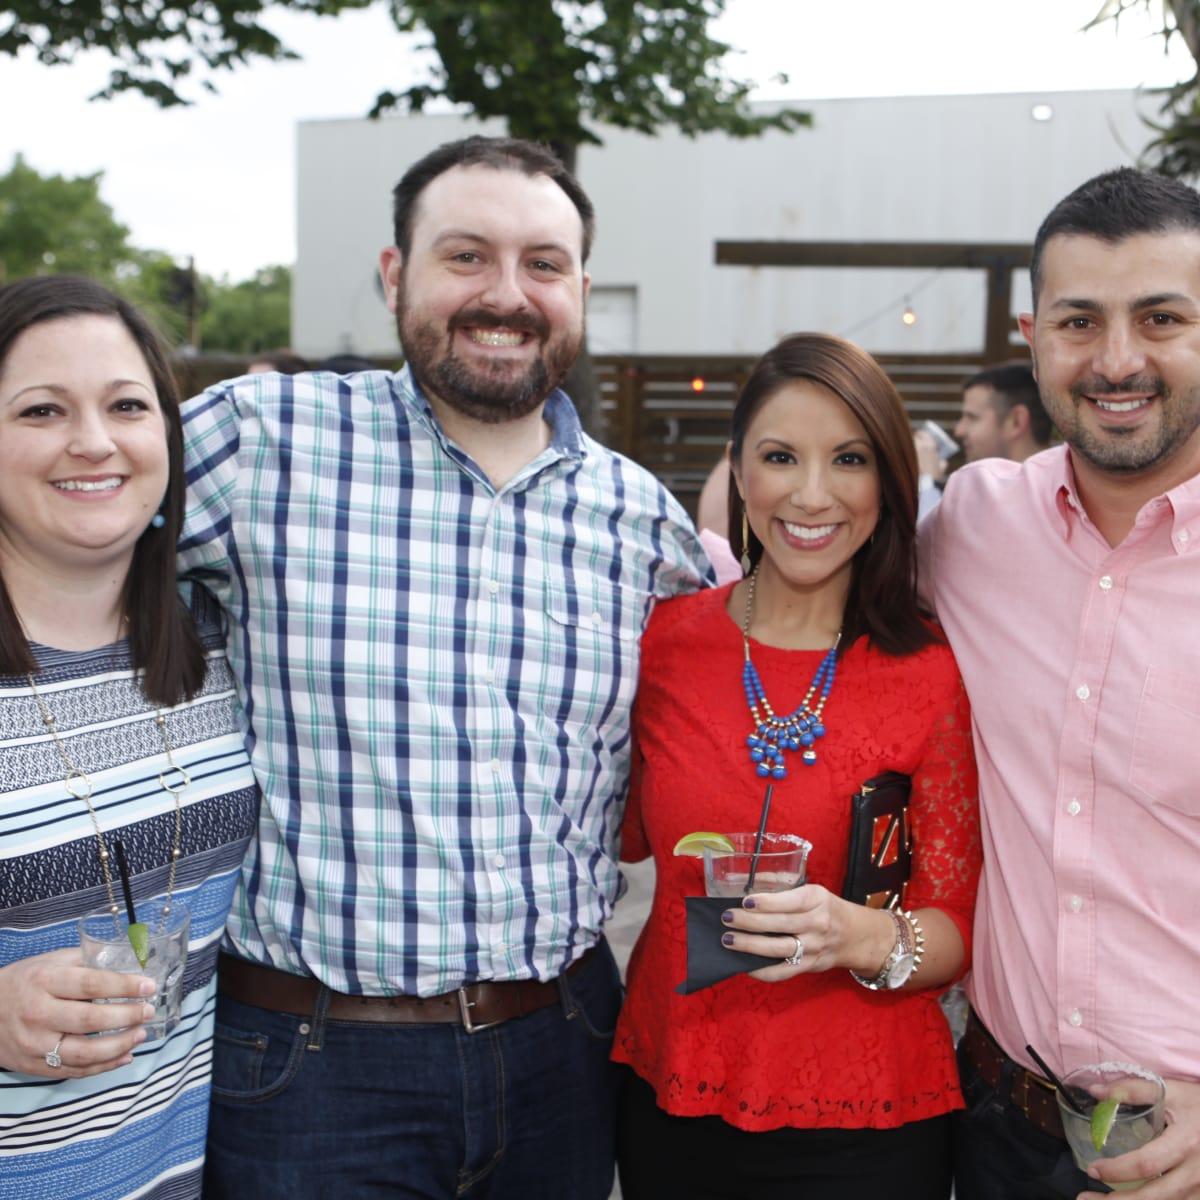 Sarah and Matt Fornea, from left, Rebecca Cantu and Talal Hariri at Friends of DePelchin's Fiesta May 2014